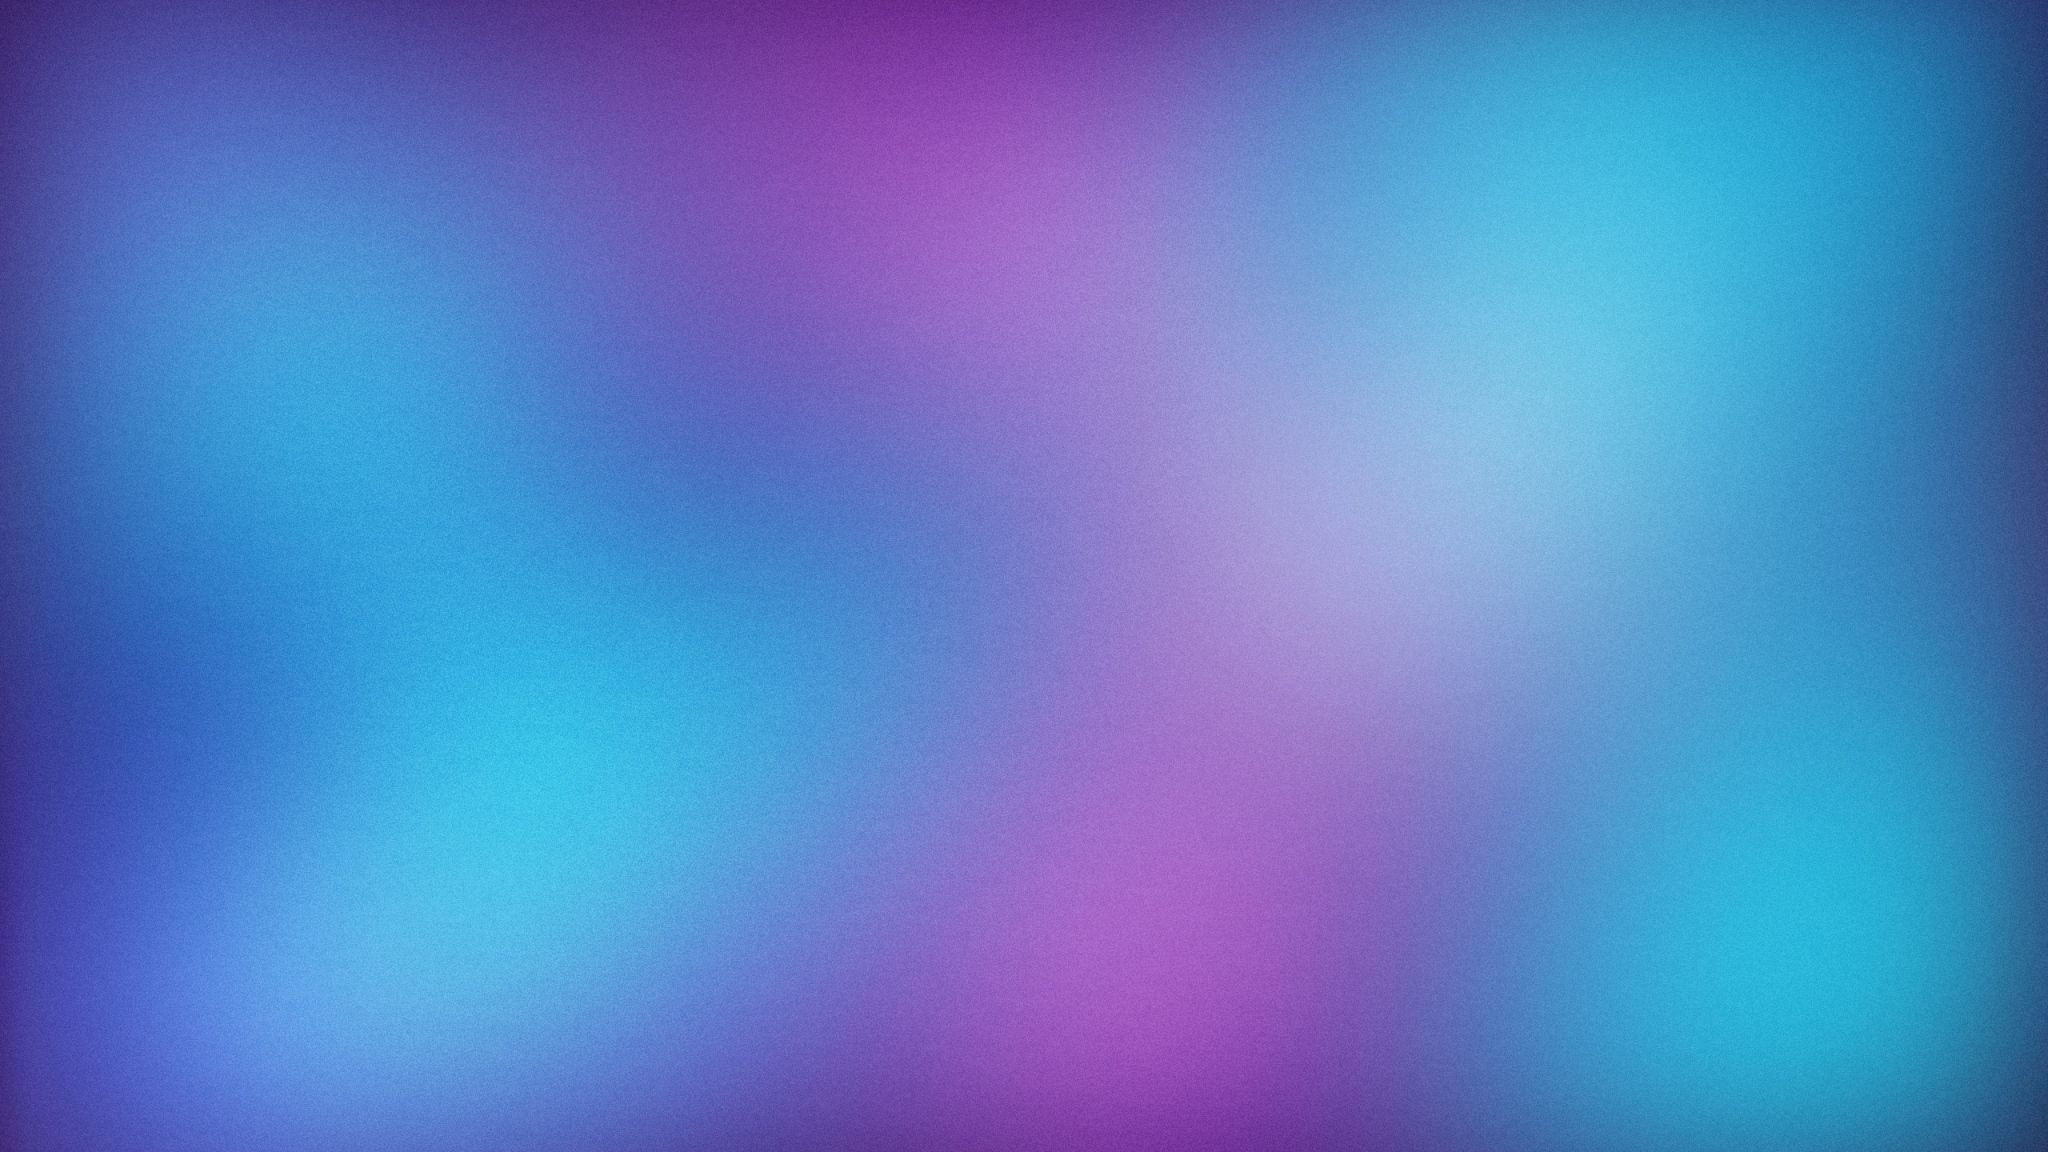 Download Wallpaper 2048x1152 Background, Spots, Bright